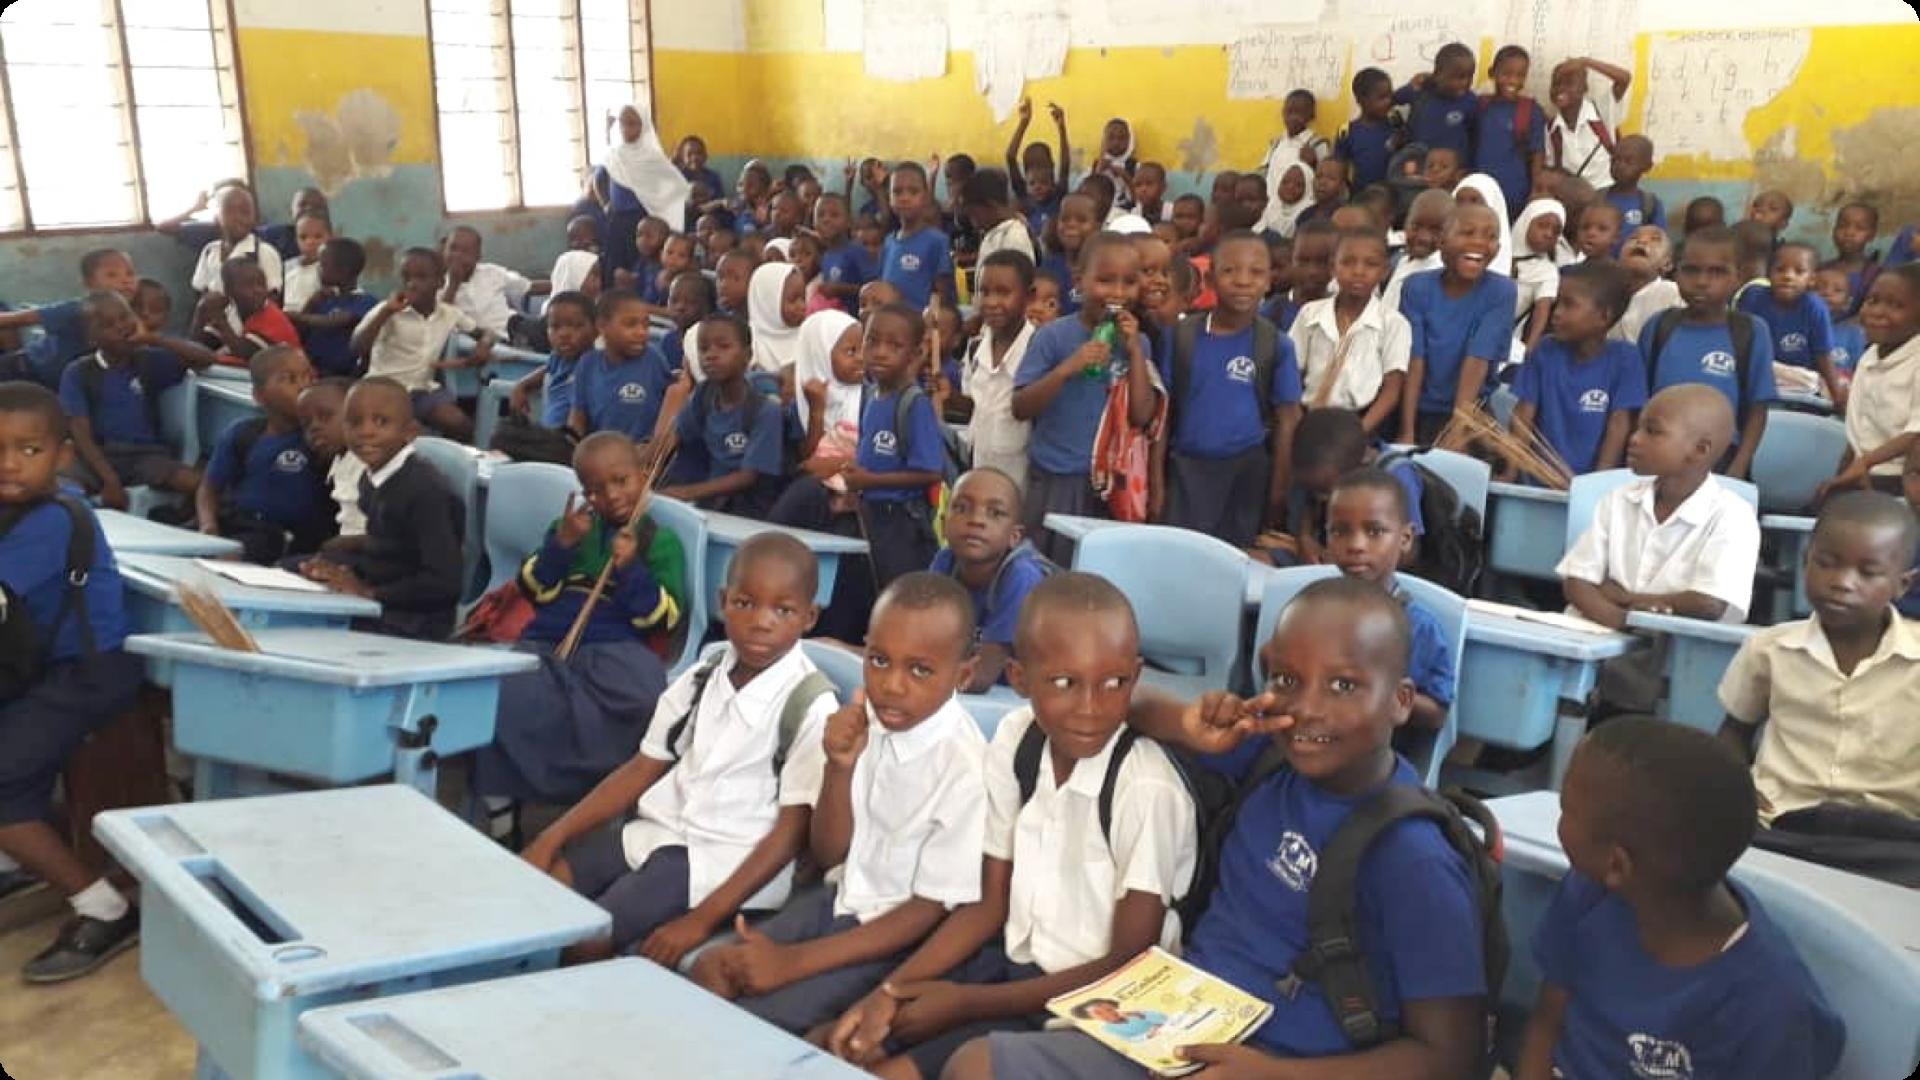 School Hygiene and Sanitation in Tanzania